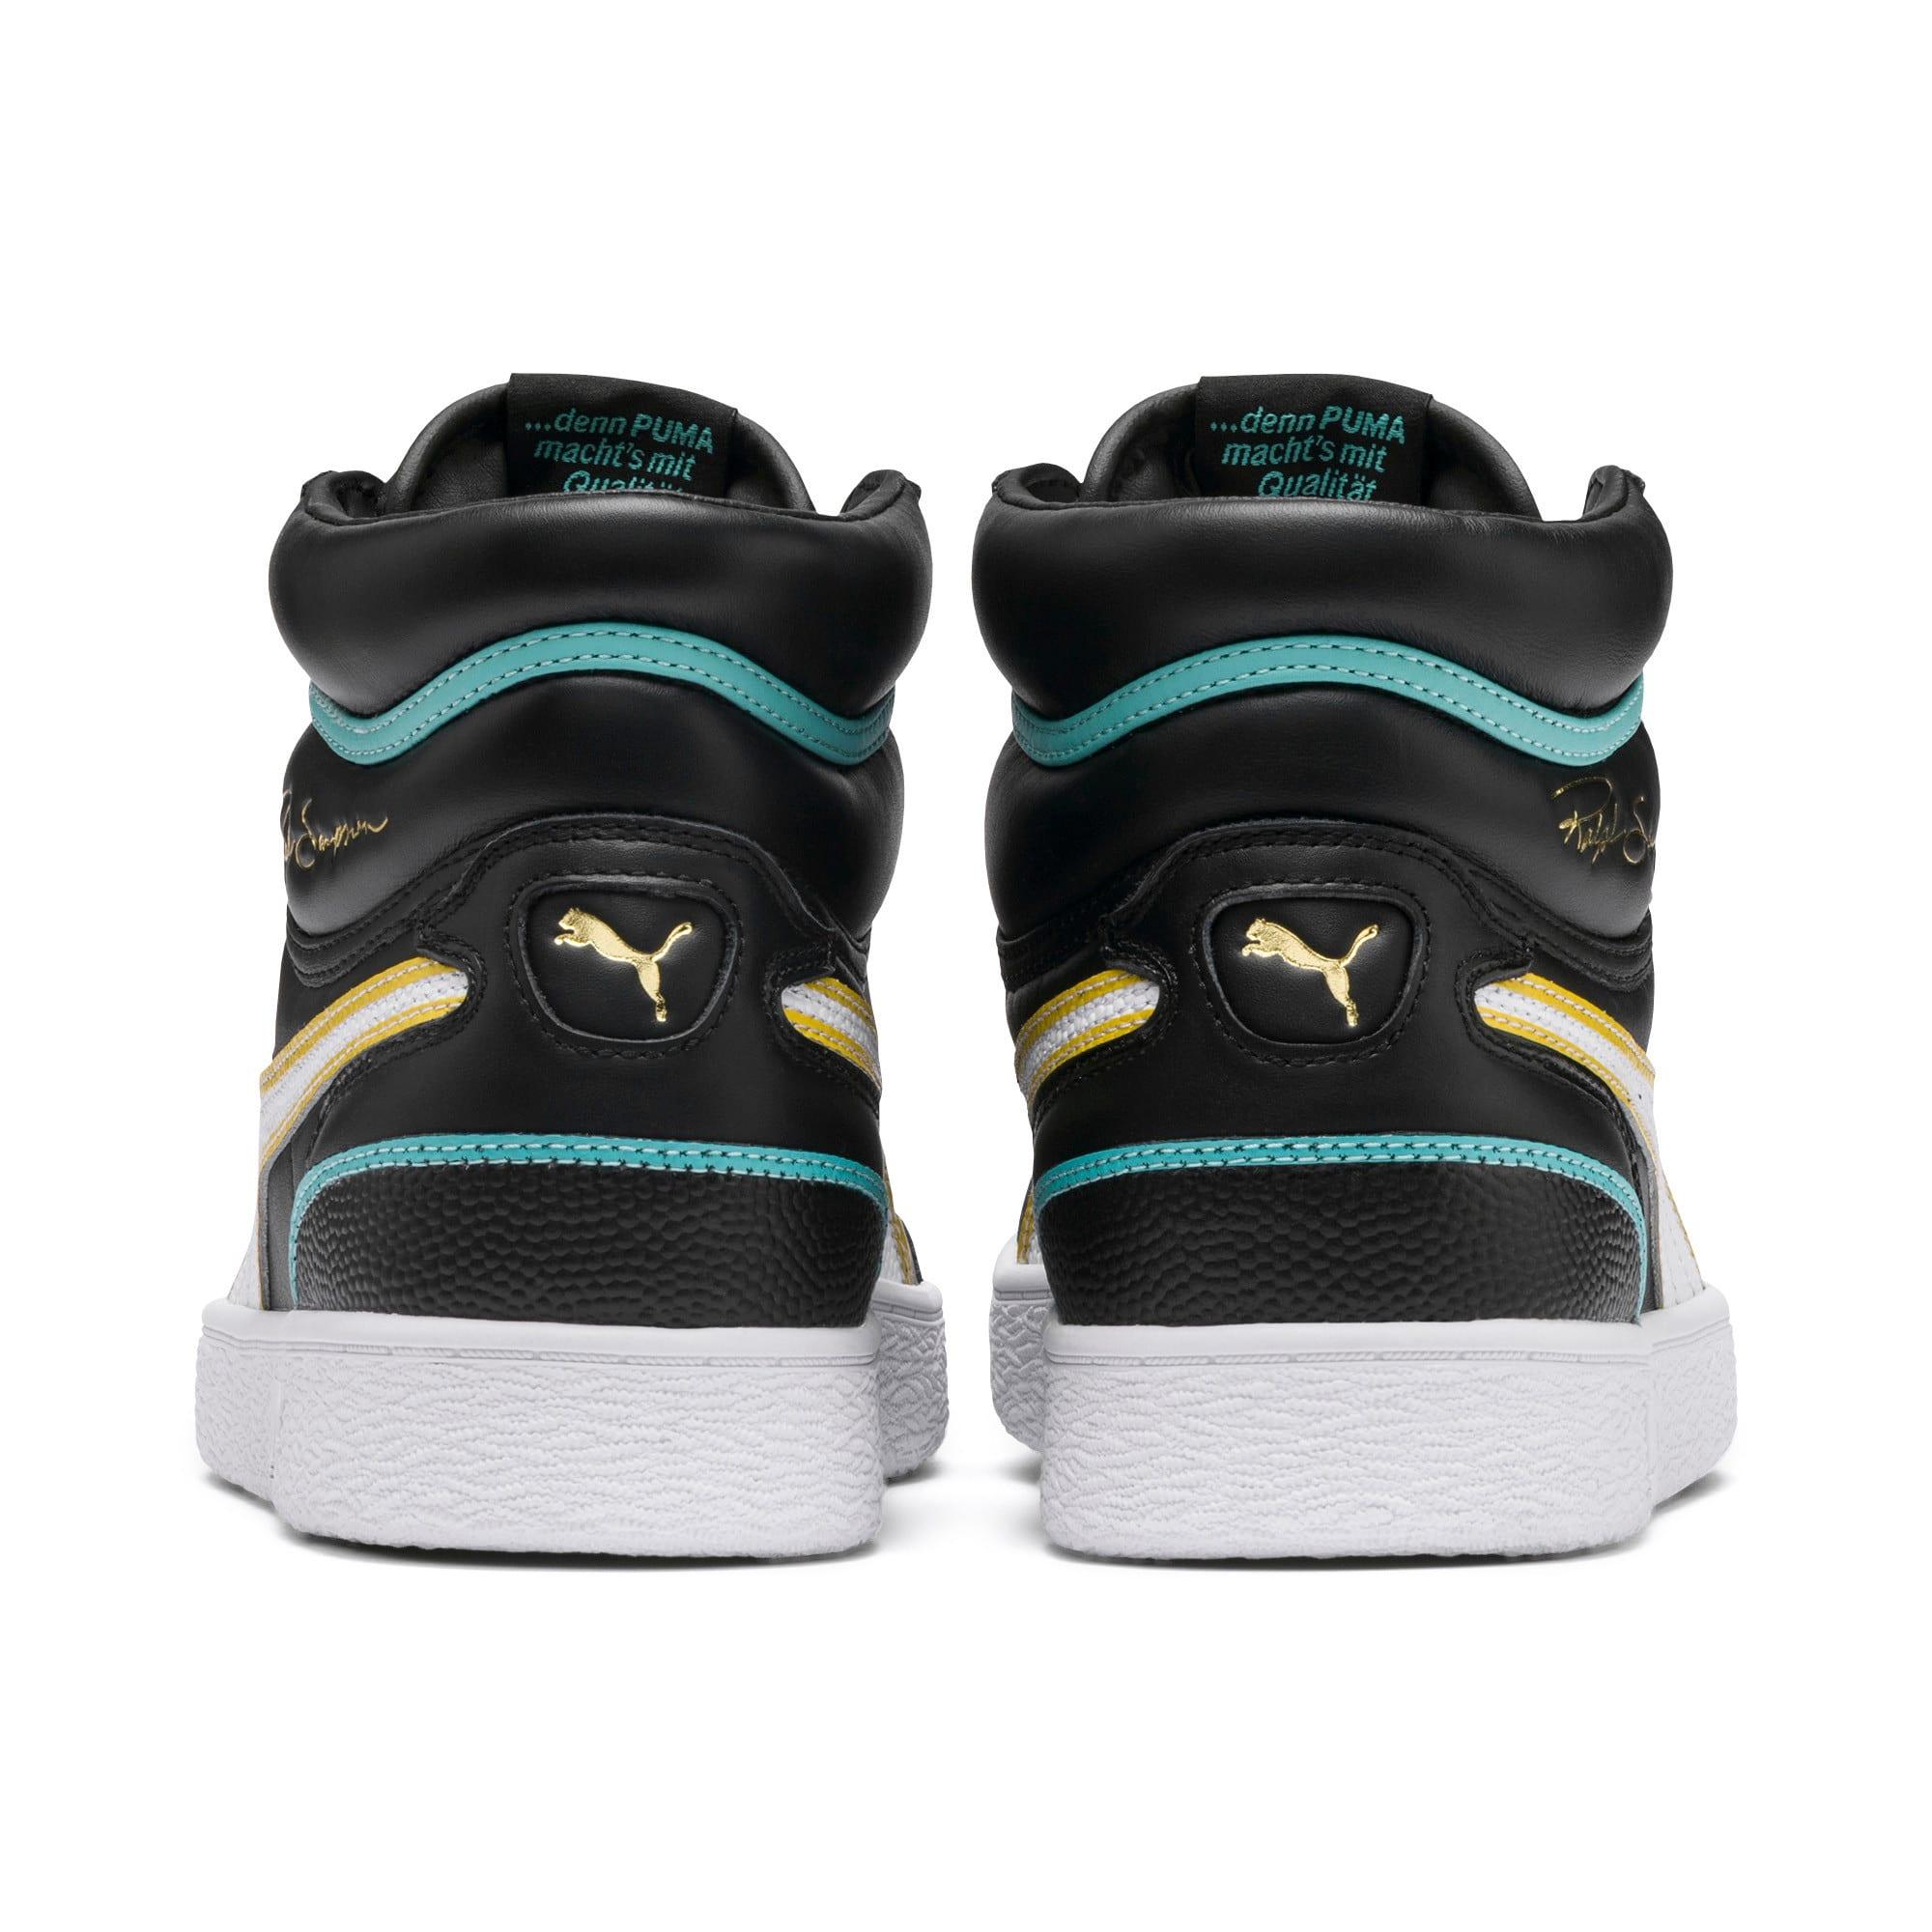 Miniatura 4 de Zapatos deportivos de caña media Ralph Sampson Hoops, Puma Blk-Puma Wht-Puma Wht, mediano